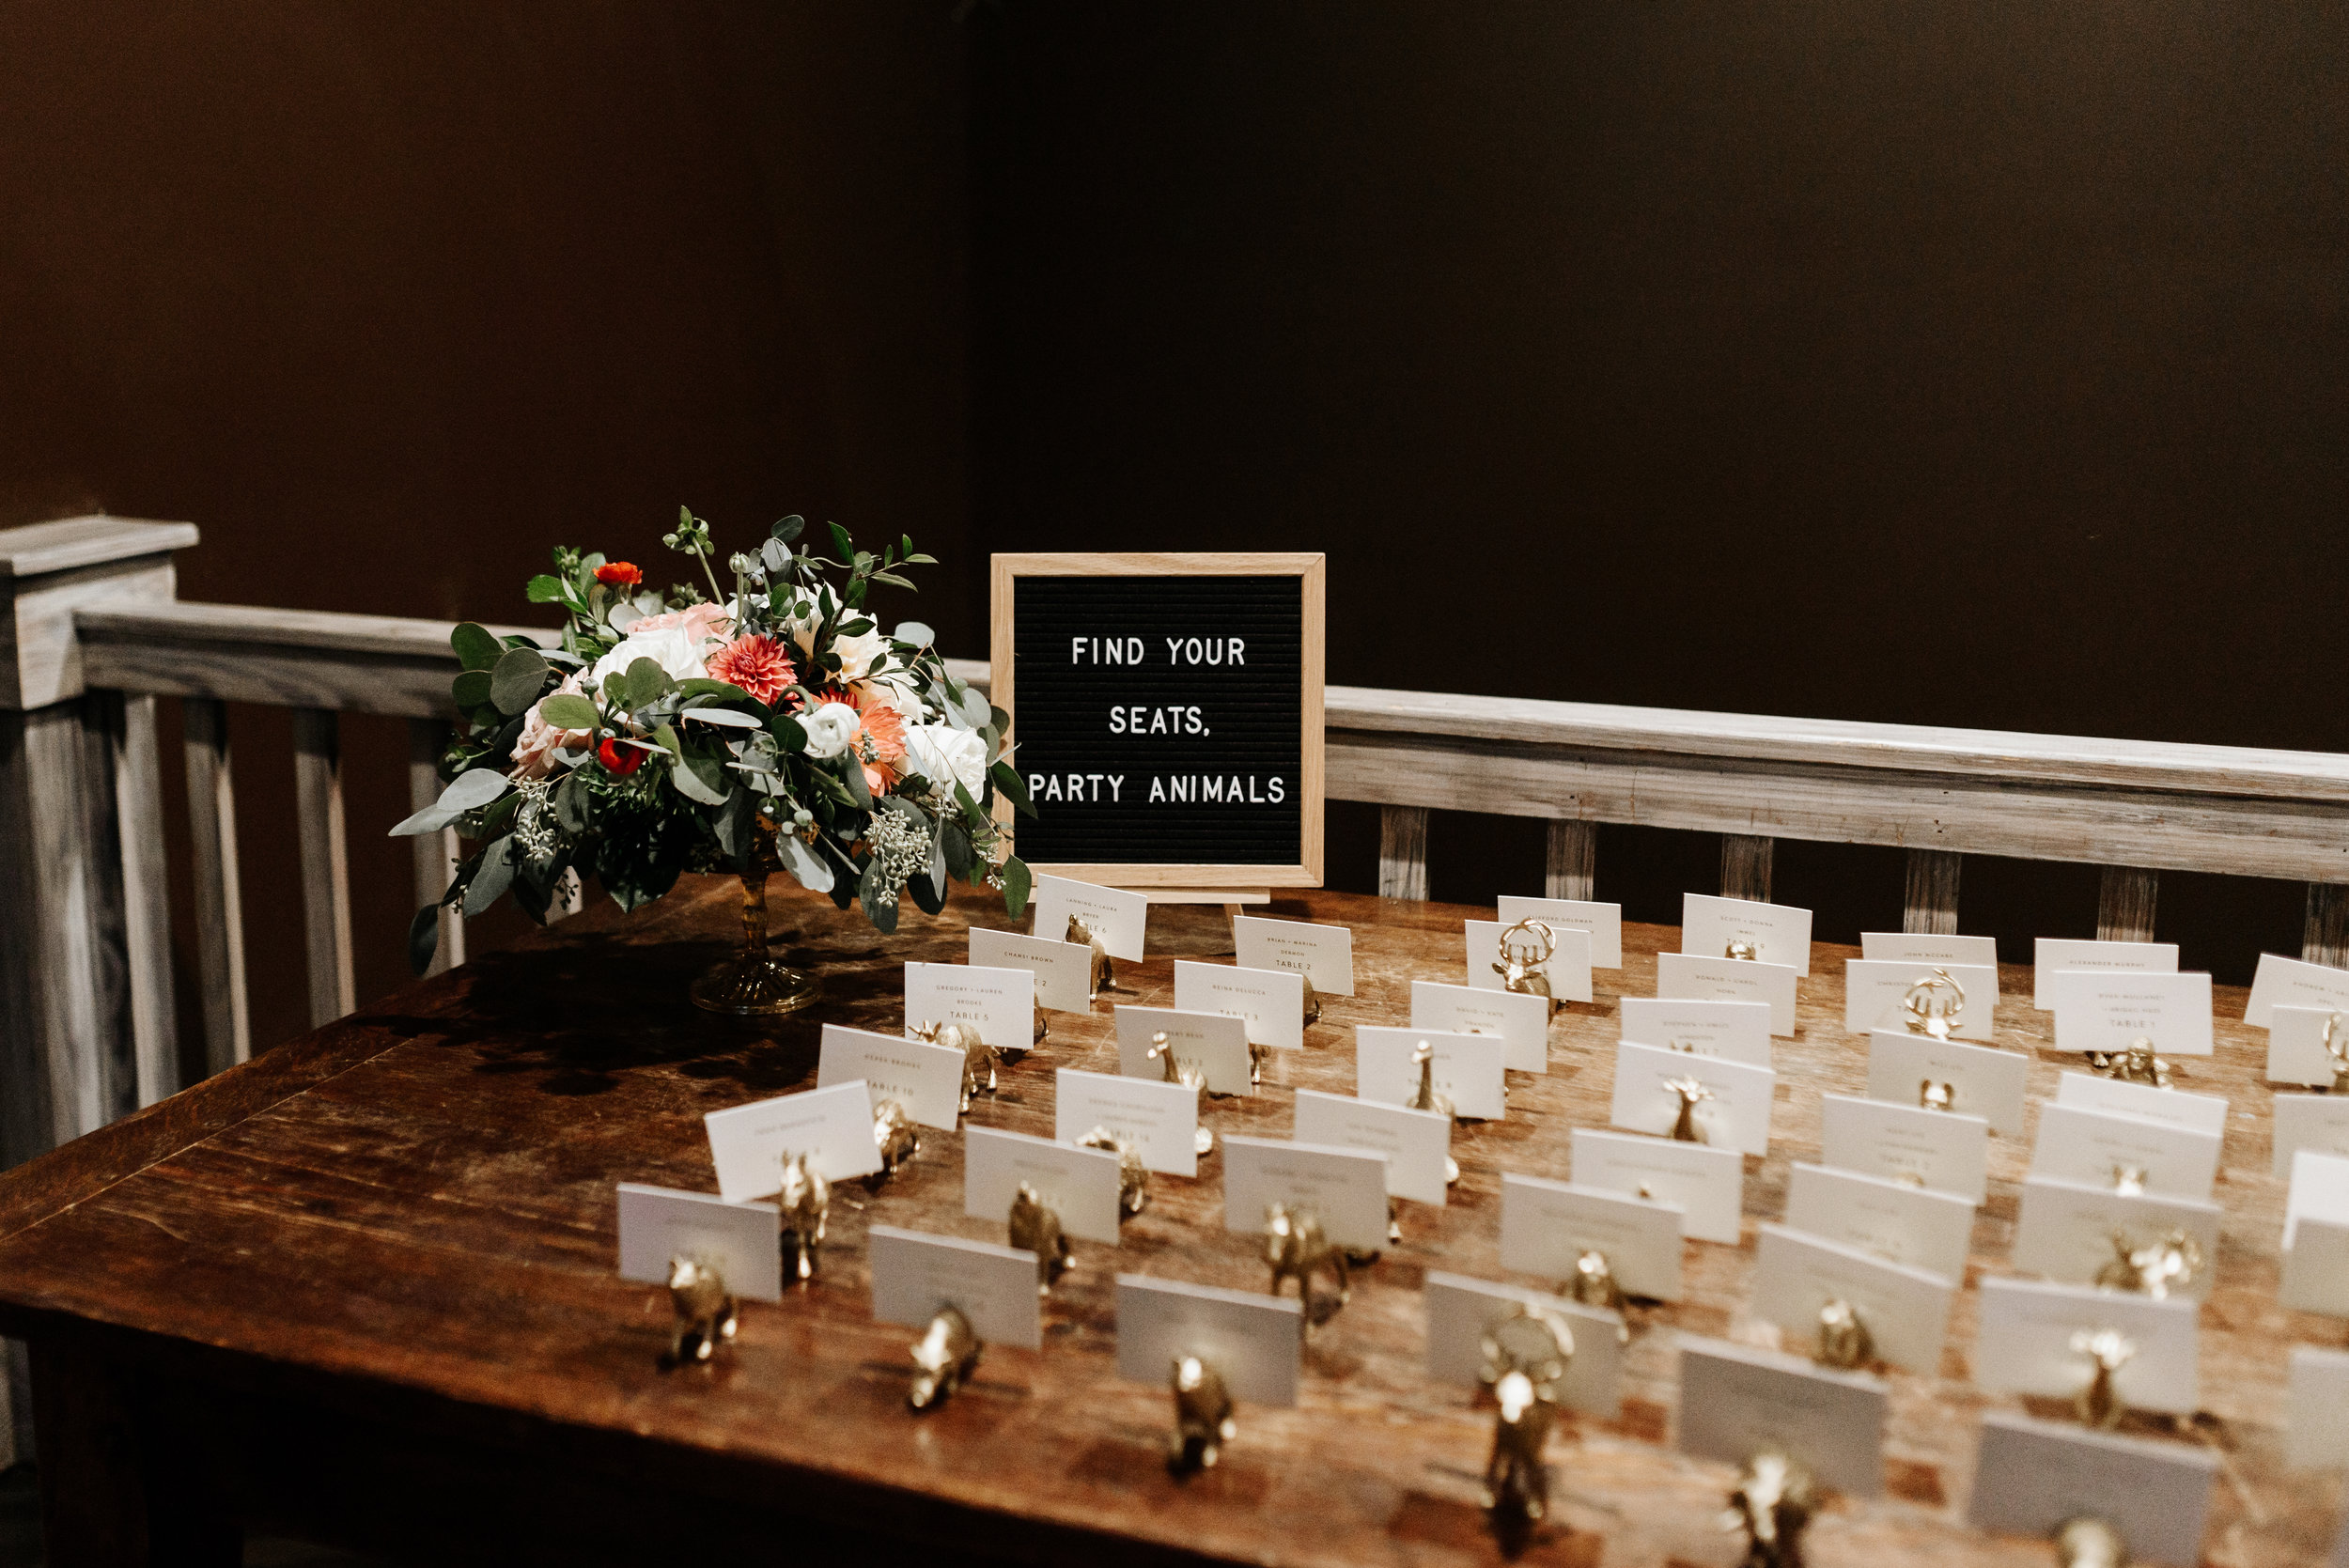 Veritas-Vineyards-and-Winery-Wedding-Photography-Afton-Virginia-Yasmin-Seth-Photography-by-V-9666.jpg